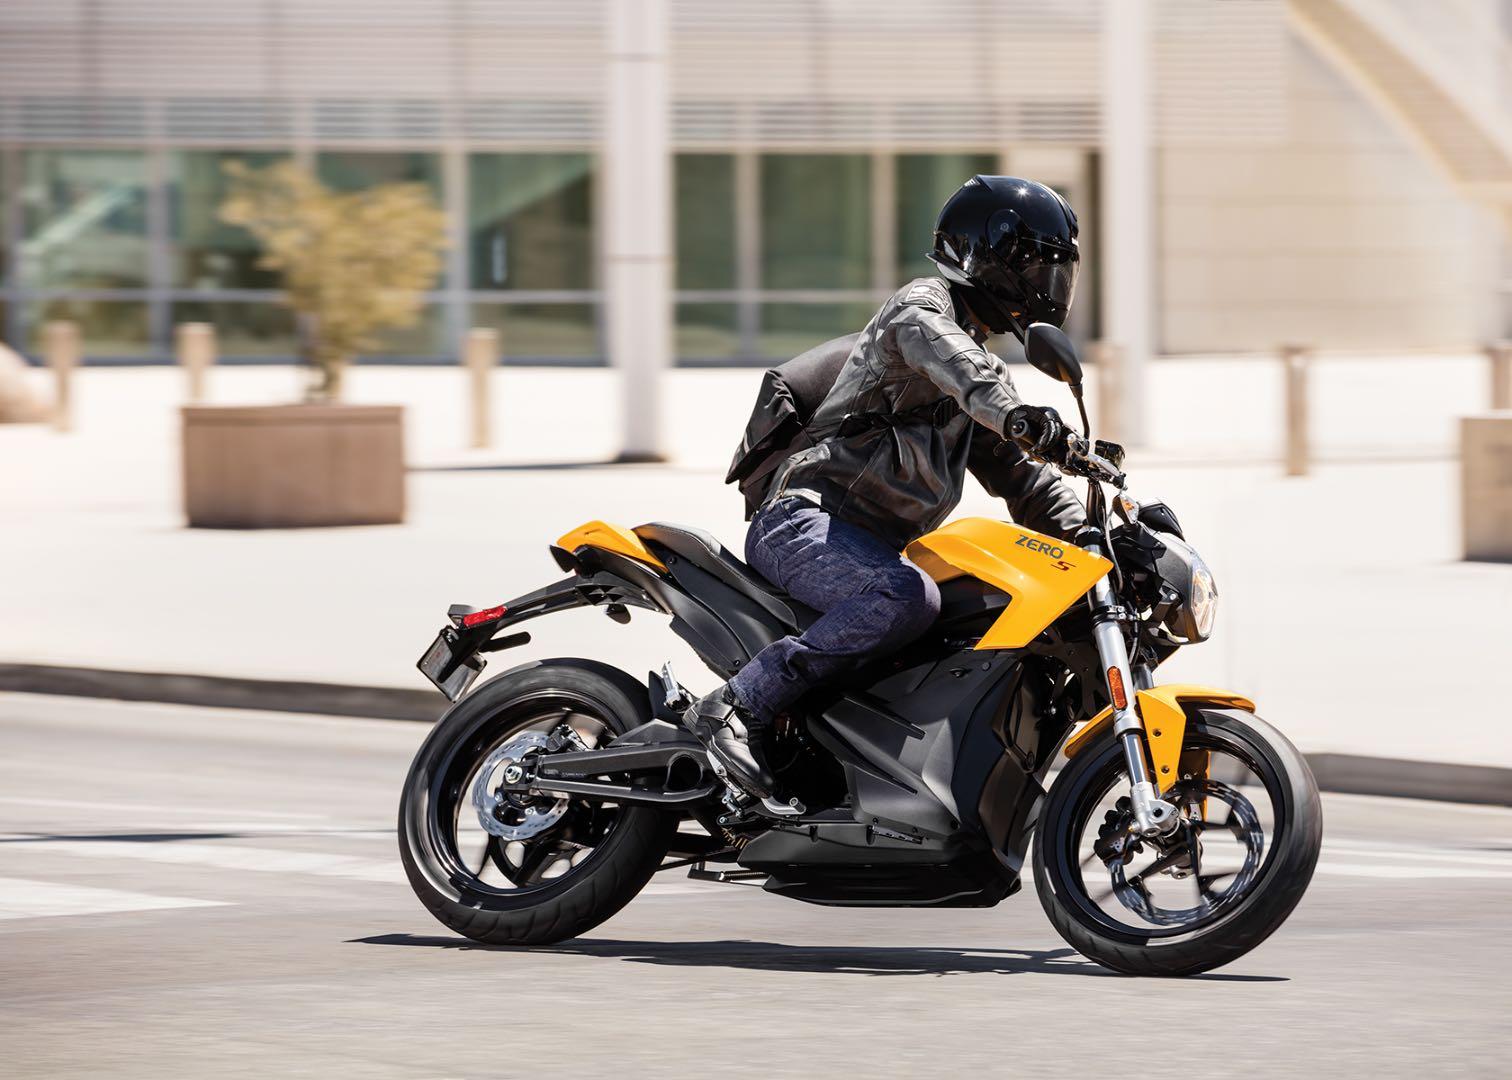 Motor cycles pic 48